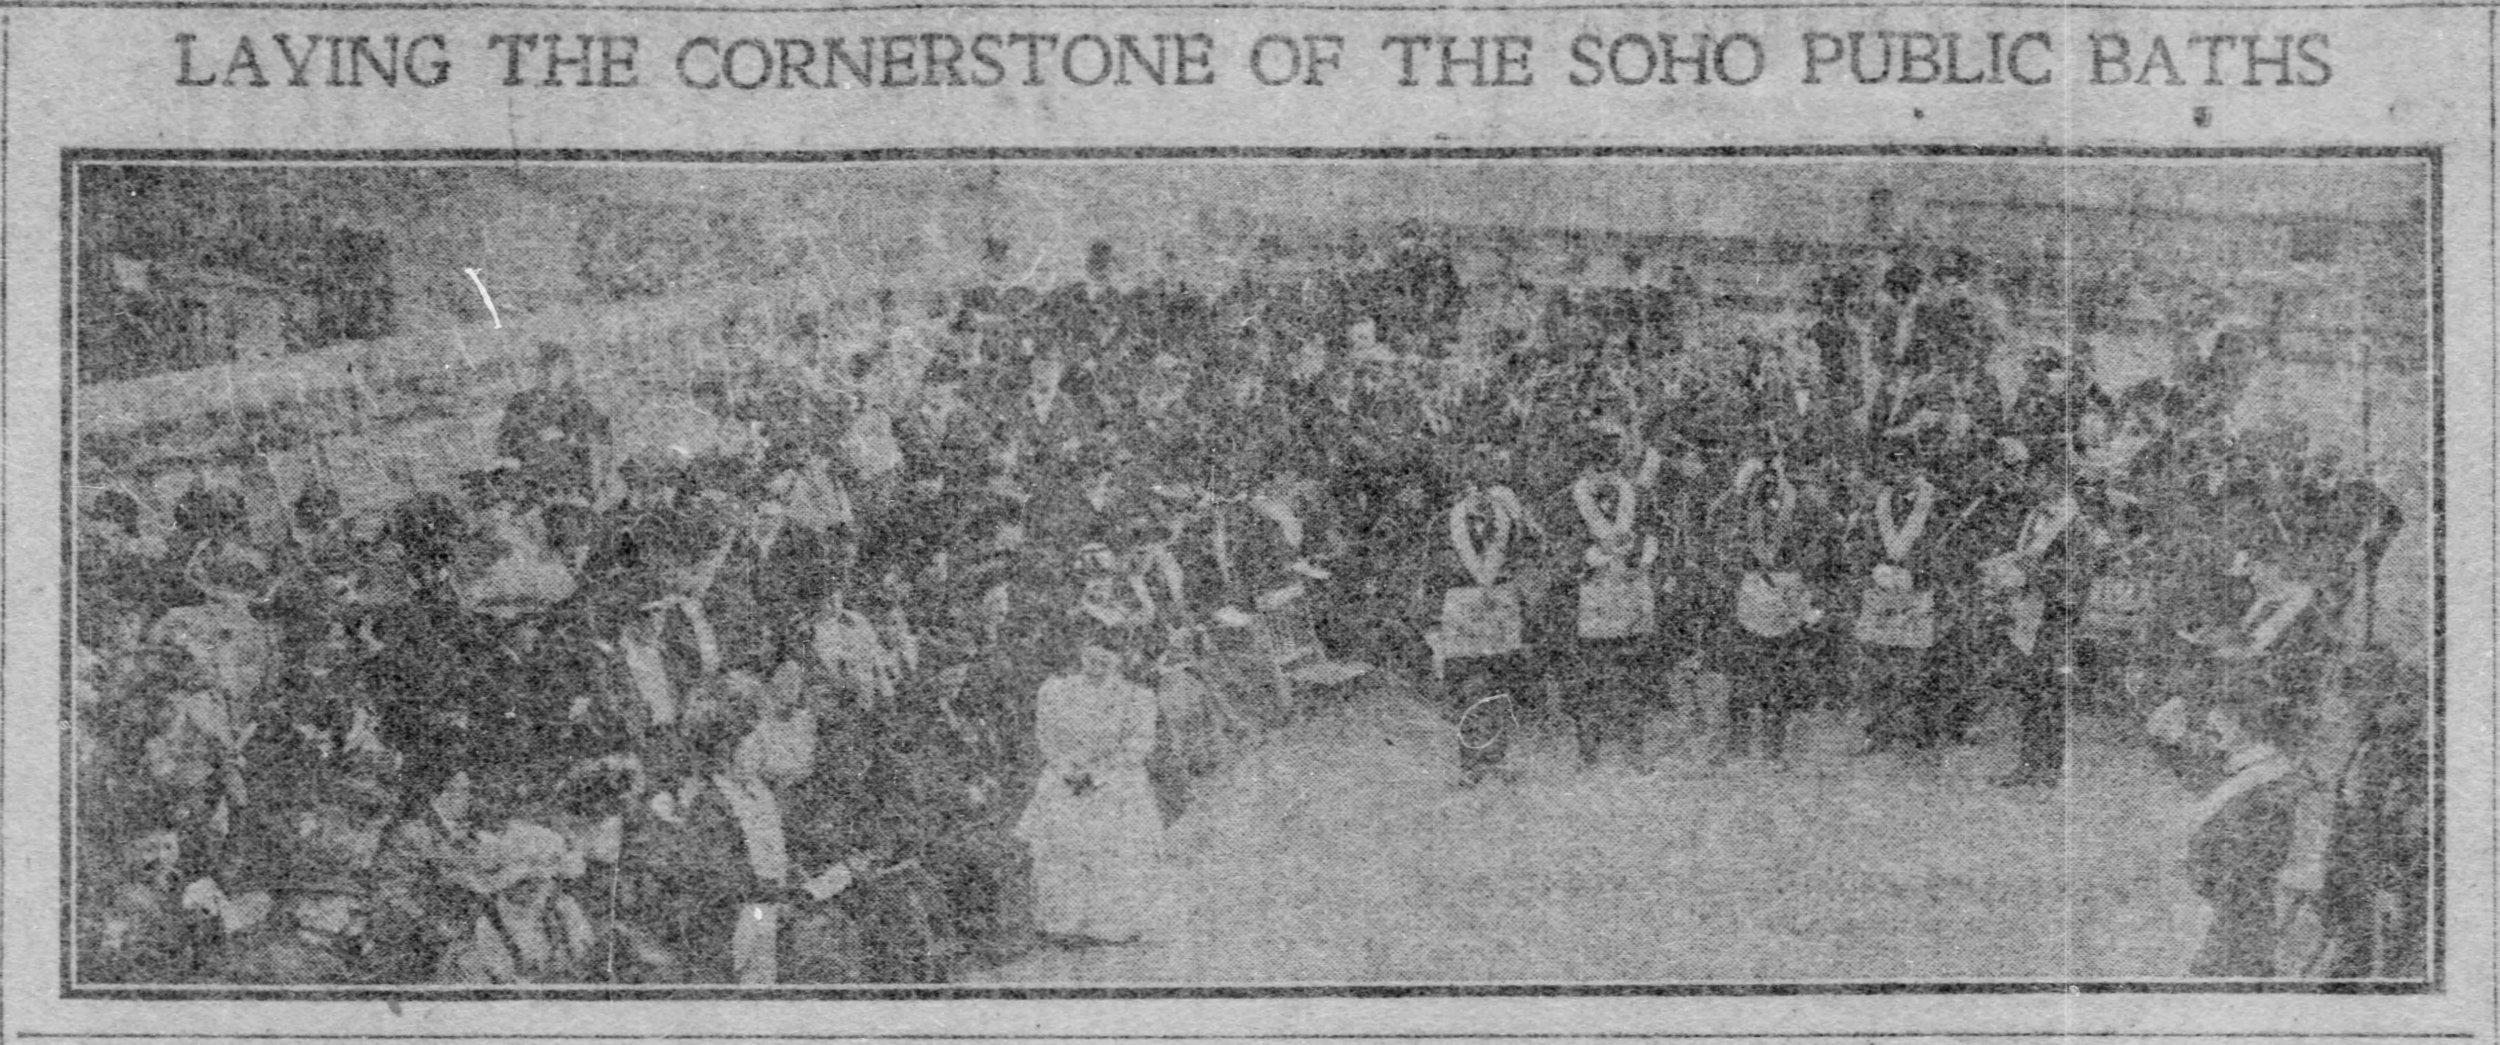 Pittsburgh_Post_Gazette_Sat__Oct_26__1907_Laying the Cornerstone of the Soho Public Baths.jpg